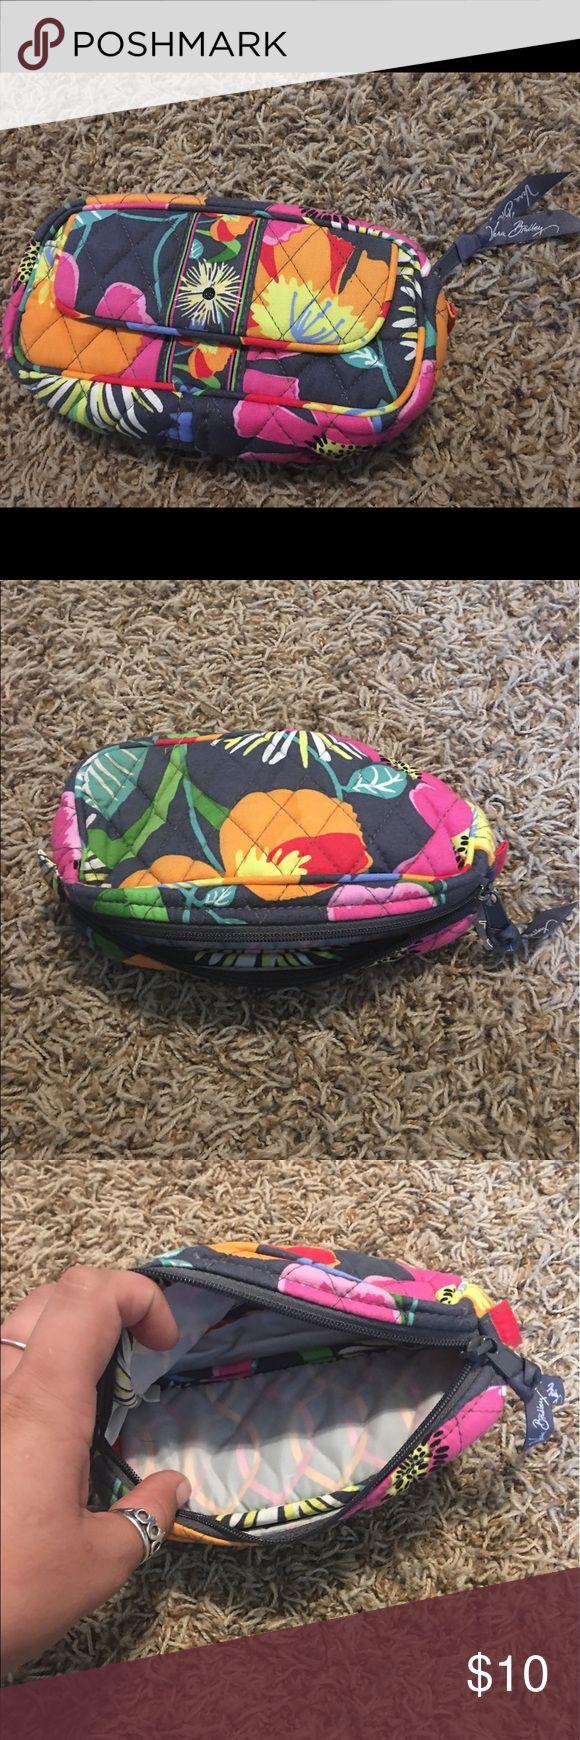 Vera Bradley Travel Make-Up Bag Used Vera Bradley make-up travel bag! Great condition! Vera Bradley Bags Cosmetic Bags & Cases